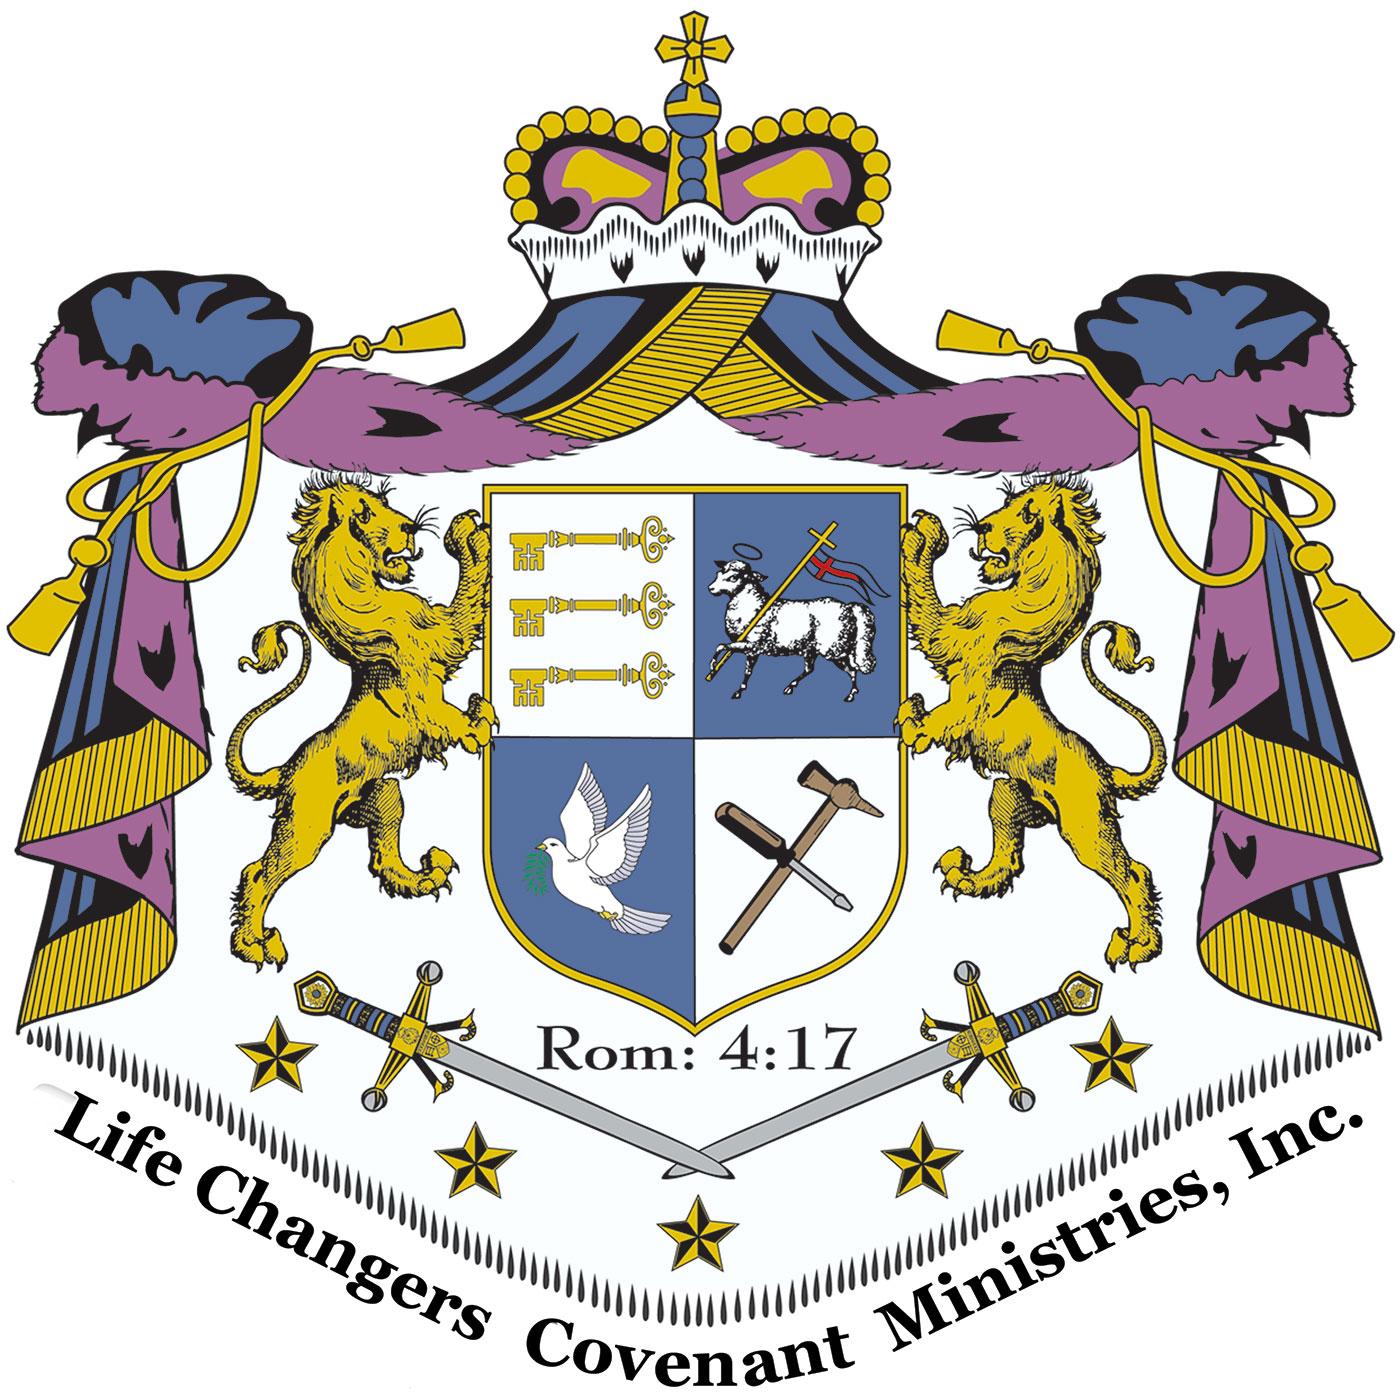 Charlie Redish Ministries